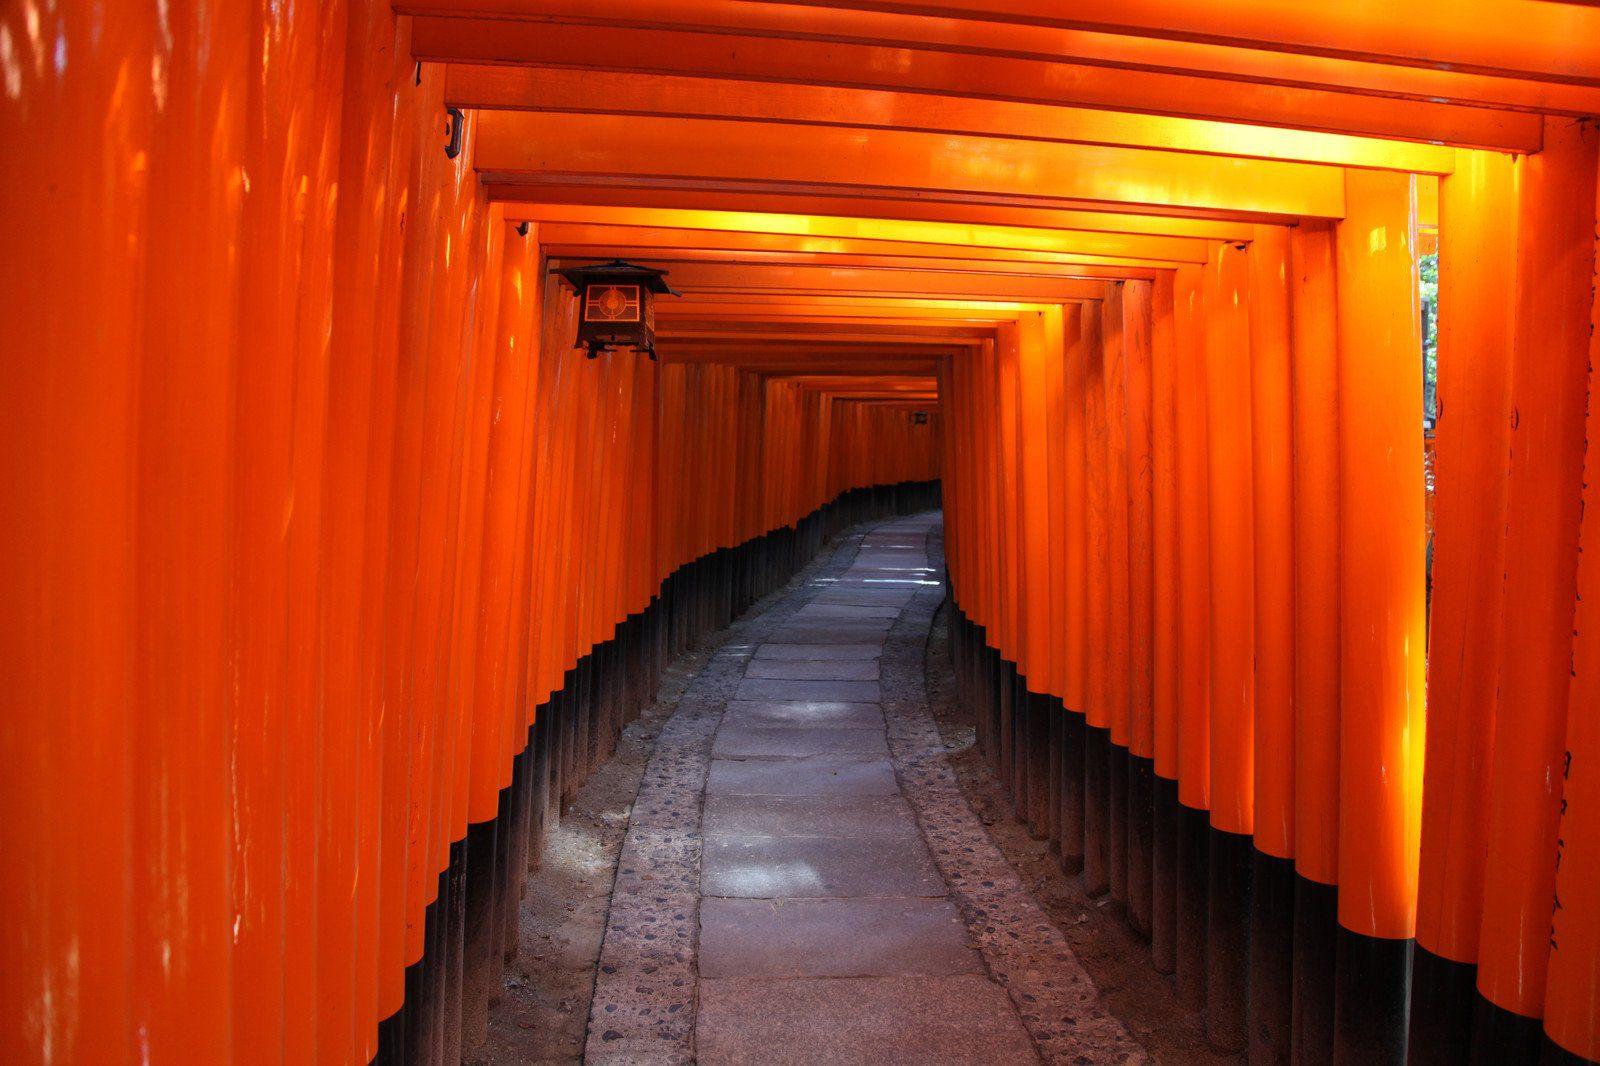 Inside the tunnel of Japanese Torii Gates at Fushimi Inari Taisha , Kyoto Japan